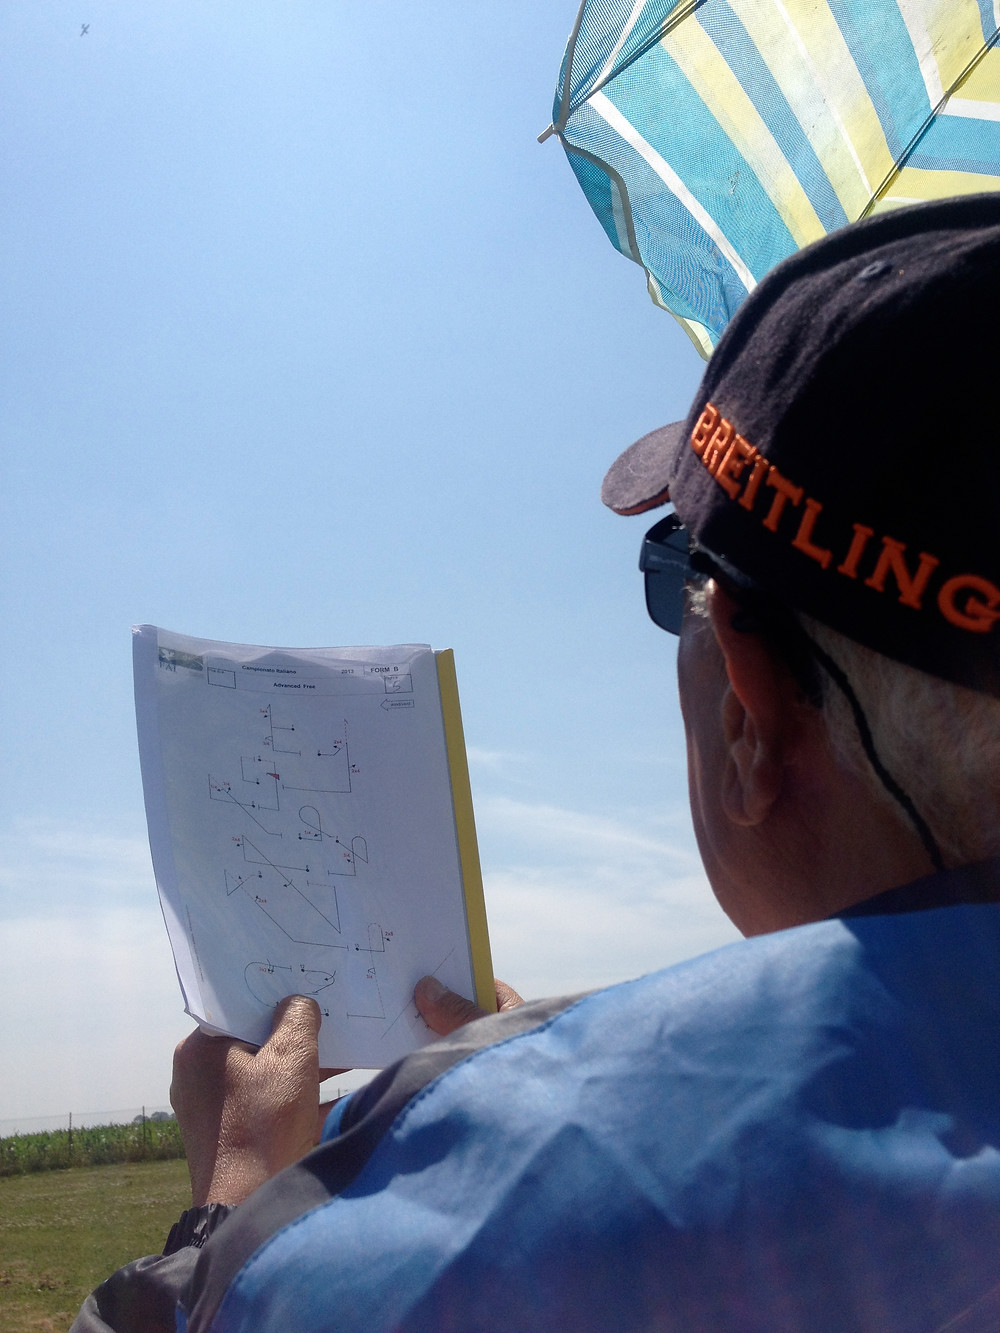 volo acrobatico, sport, acrobazia aerea, Aldo Marengo